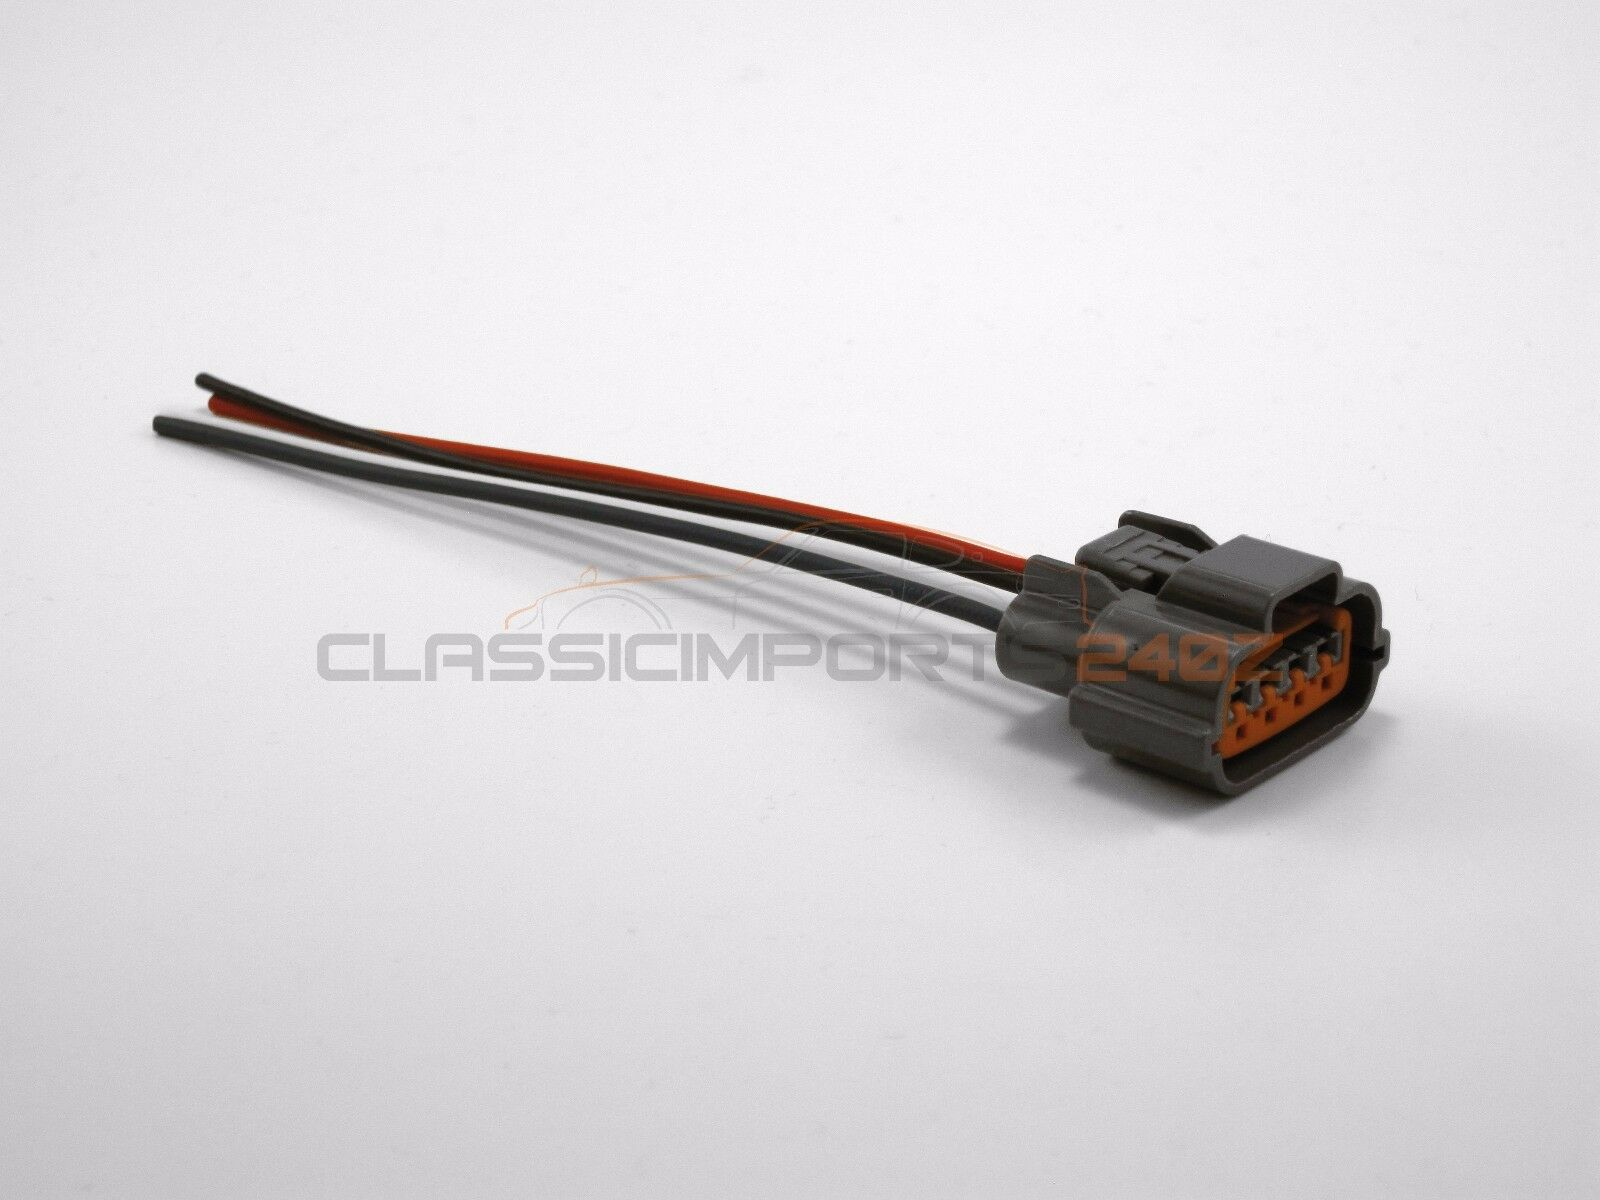 hight resolution of nissan maxima alternator wiring manual e book 2002 nissan maxima alternator wiring harness nissan maxima alternator wiring